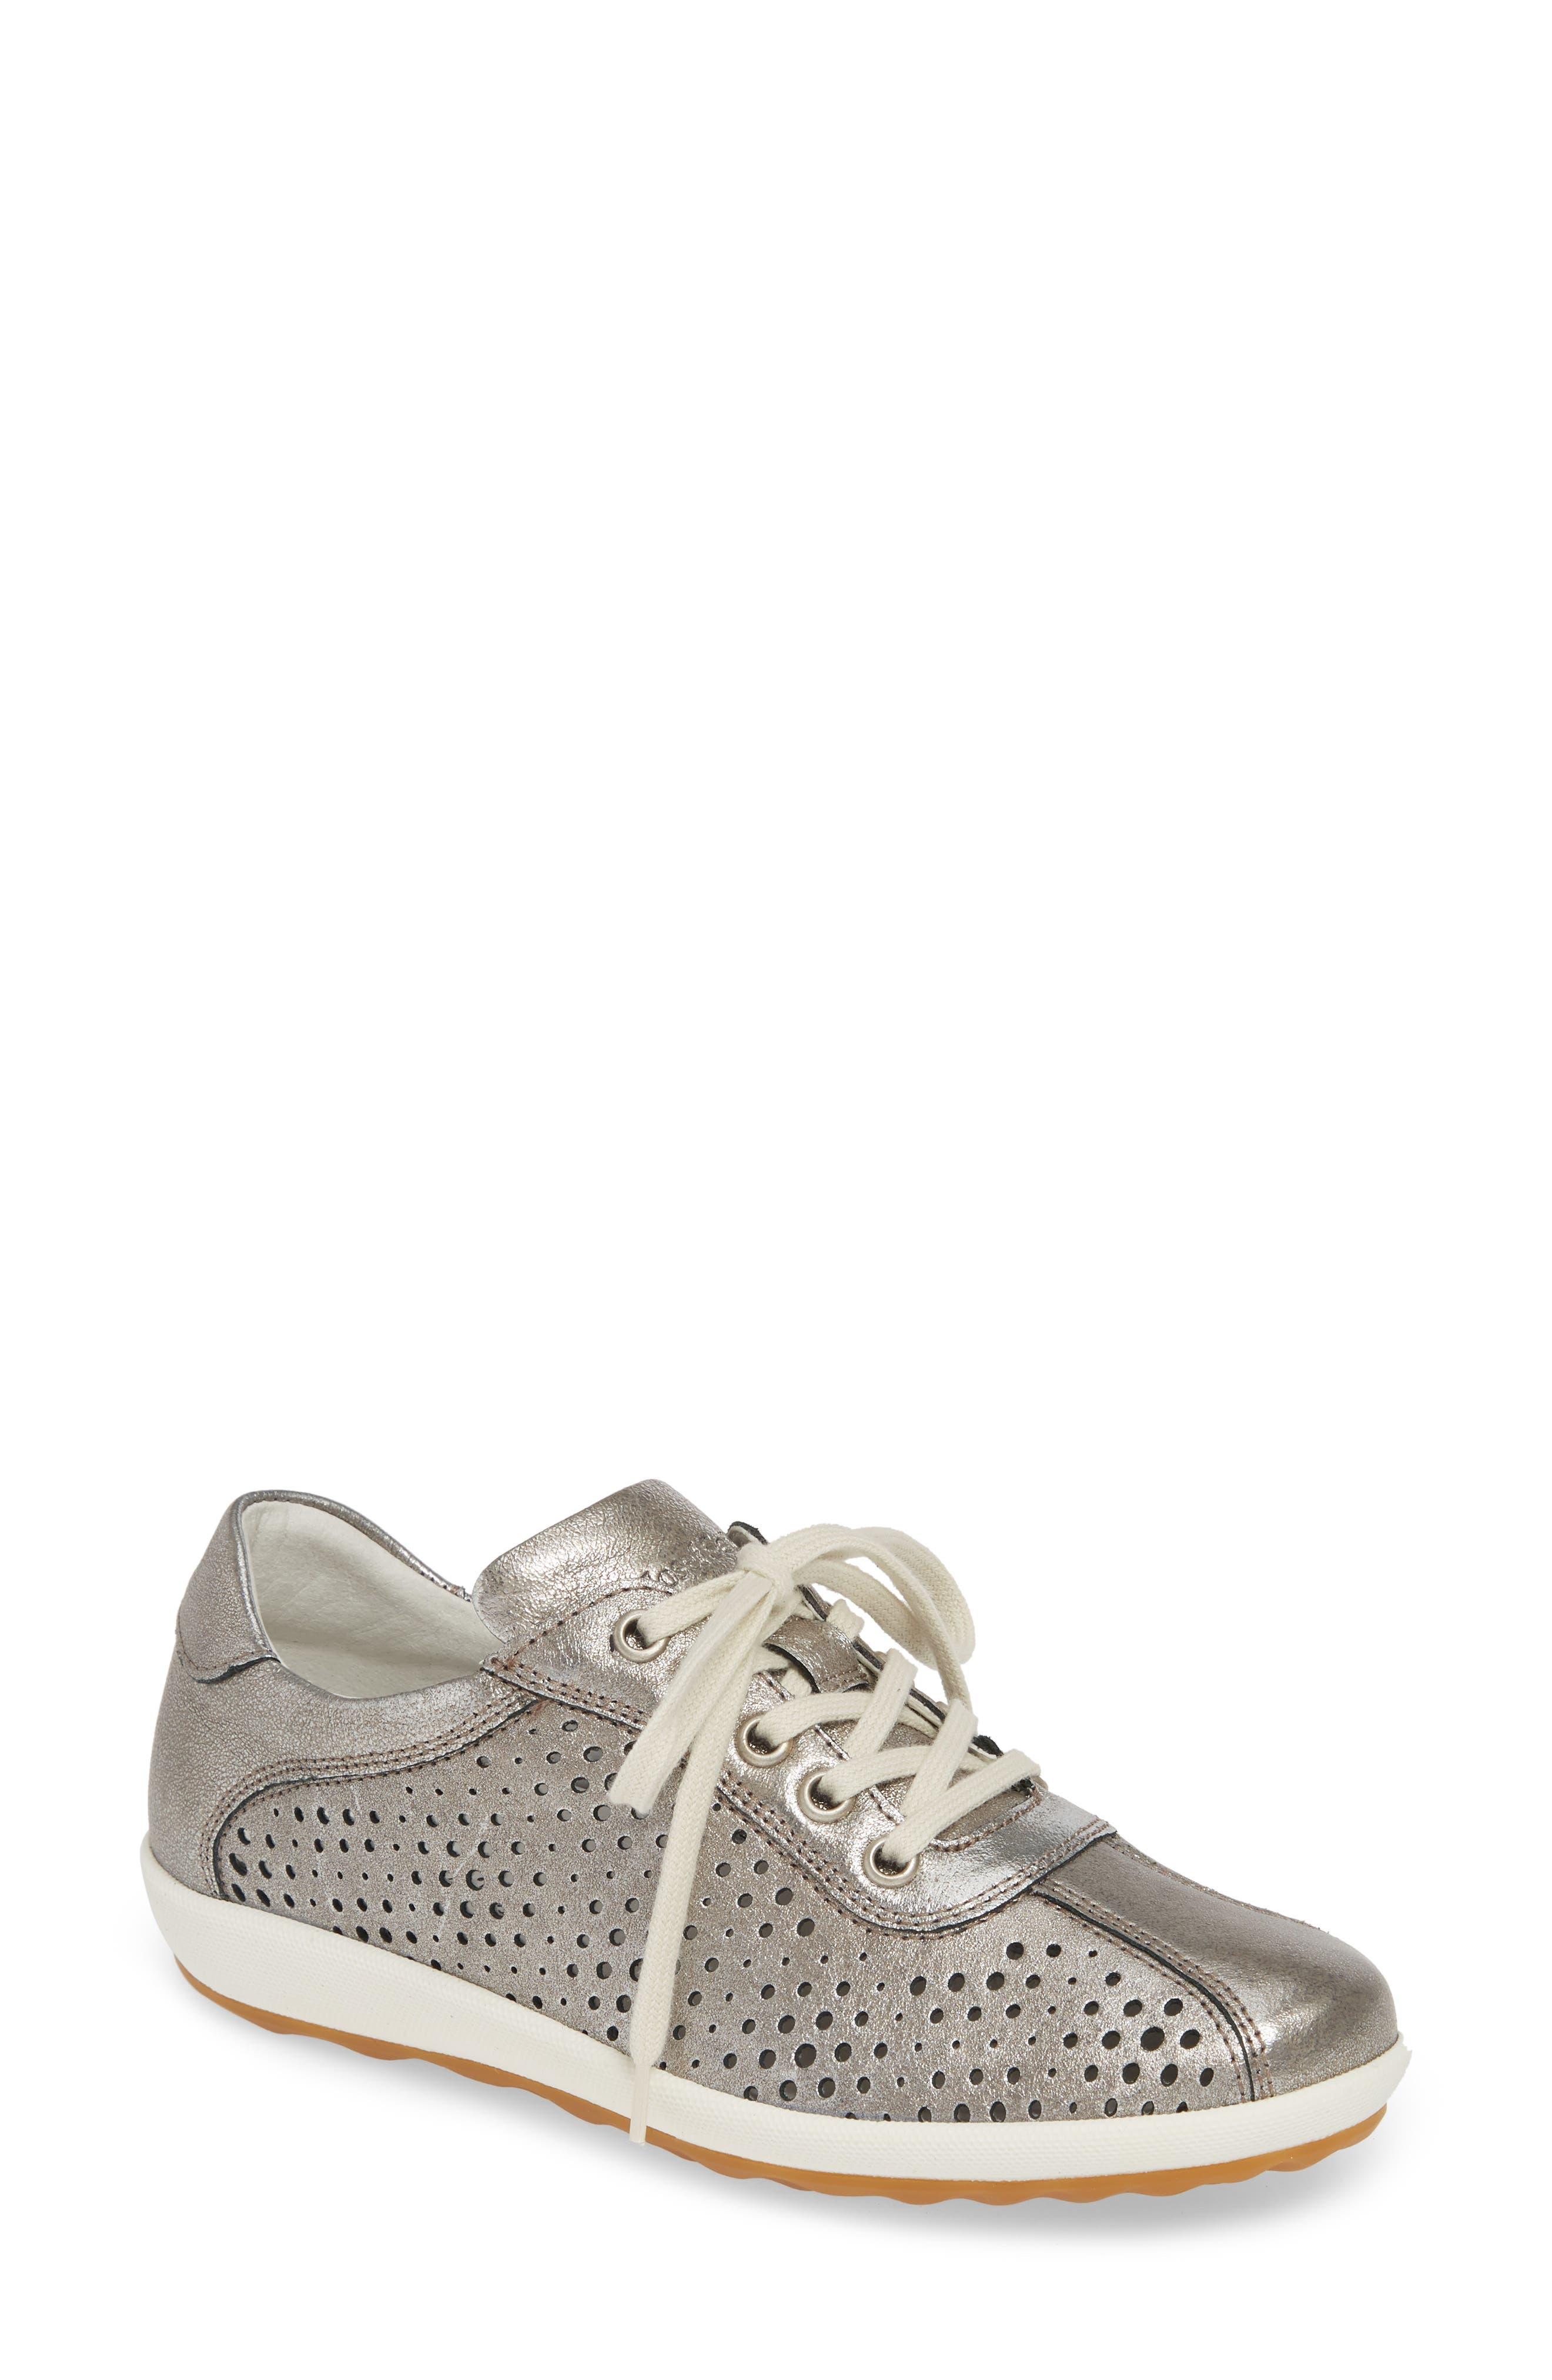 Josef Seibel Viola 09 Sneaker, Grey